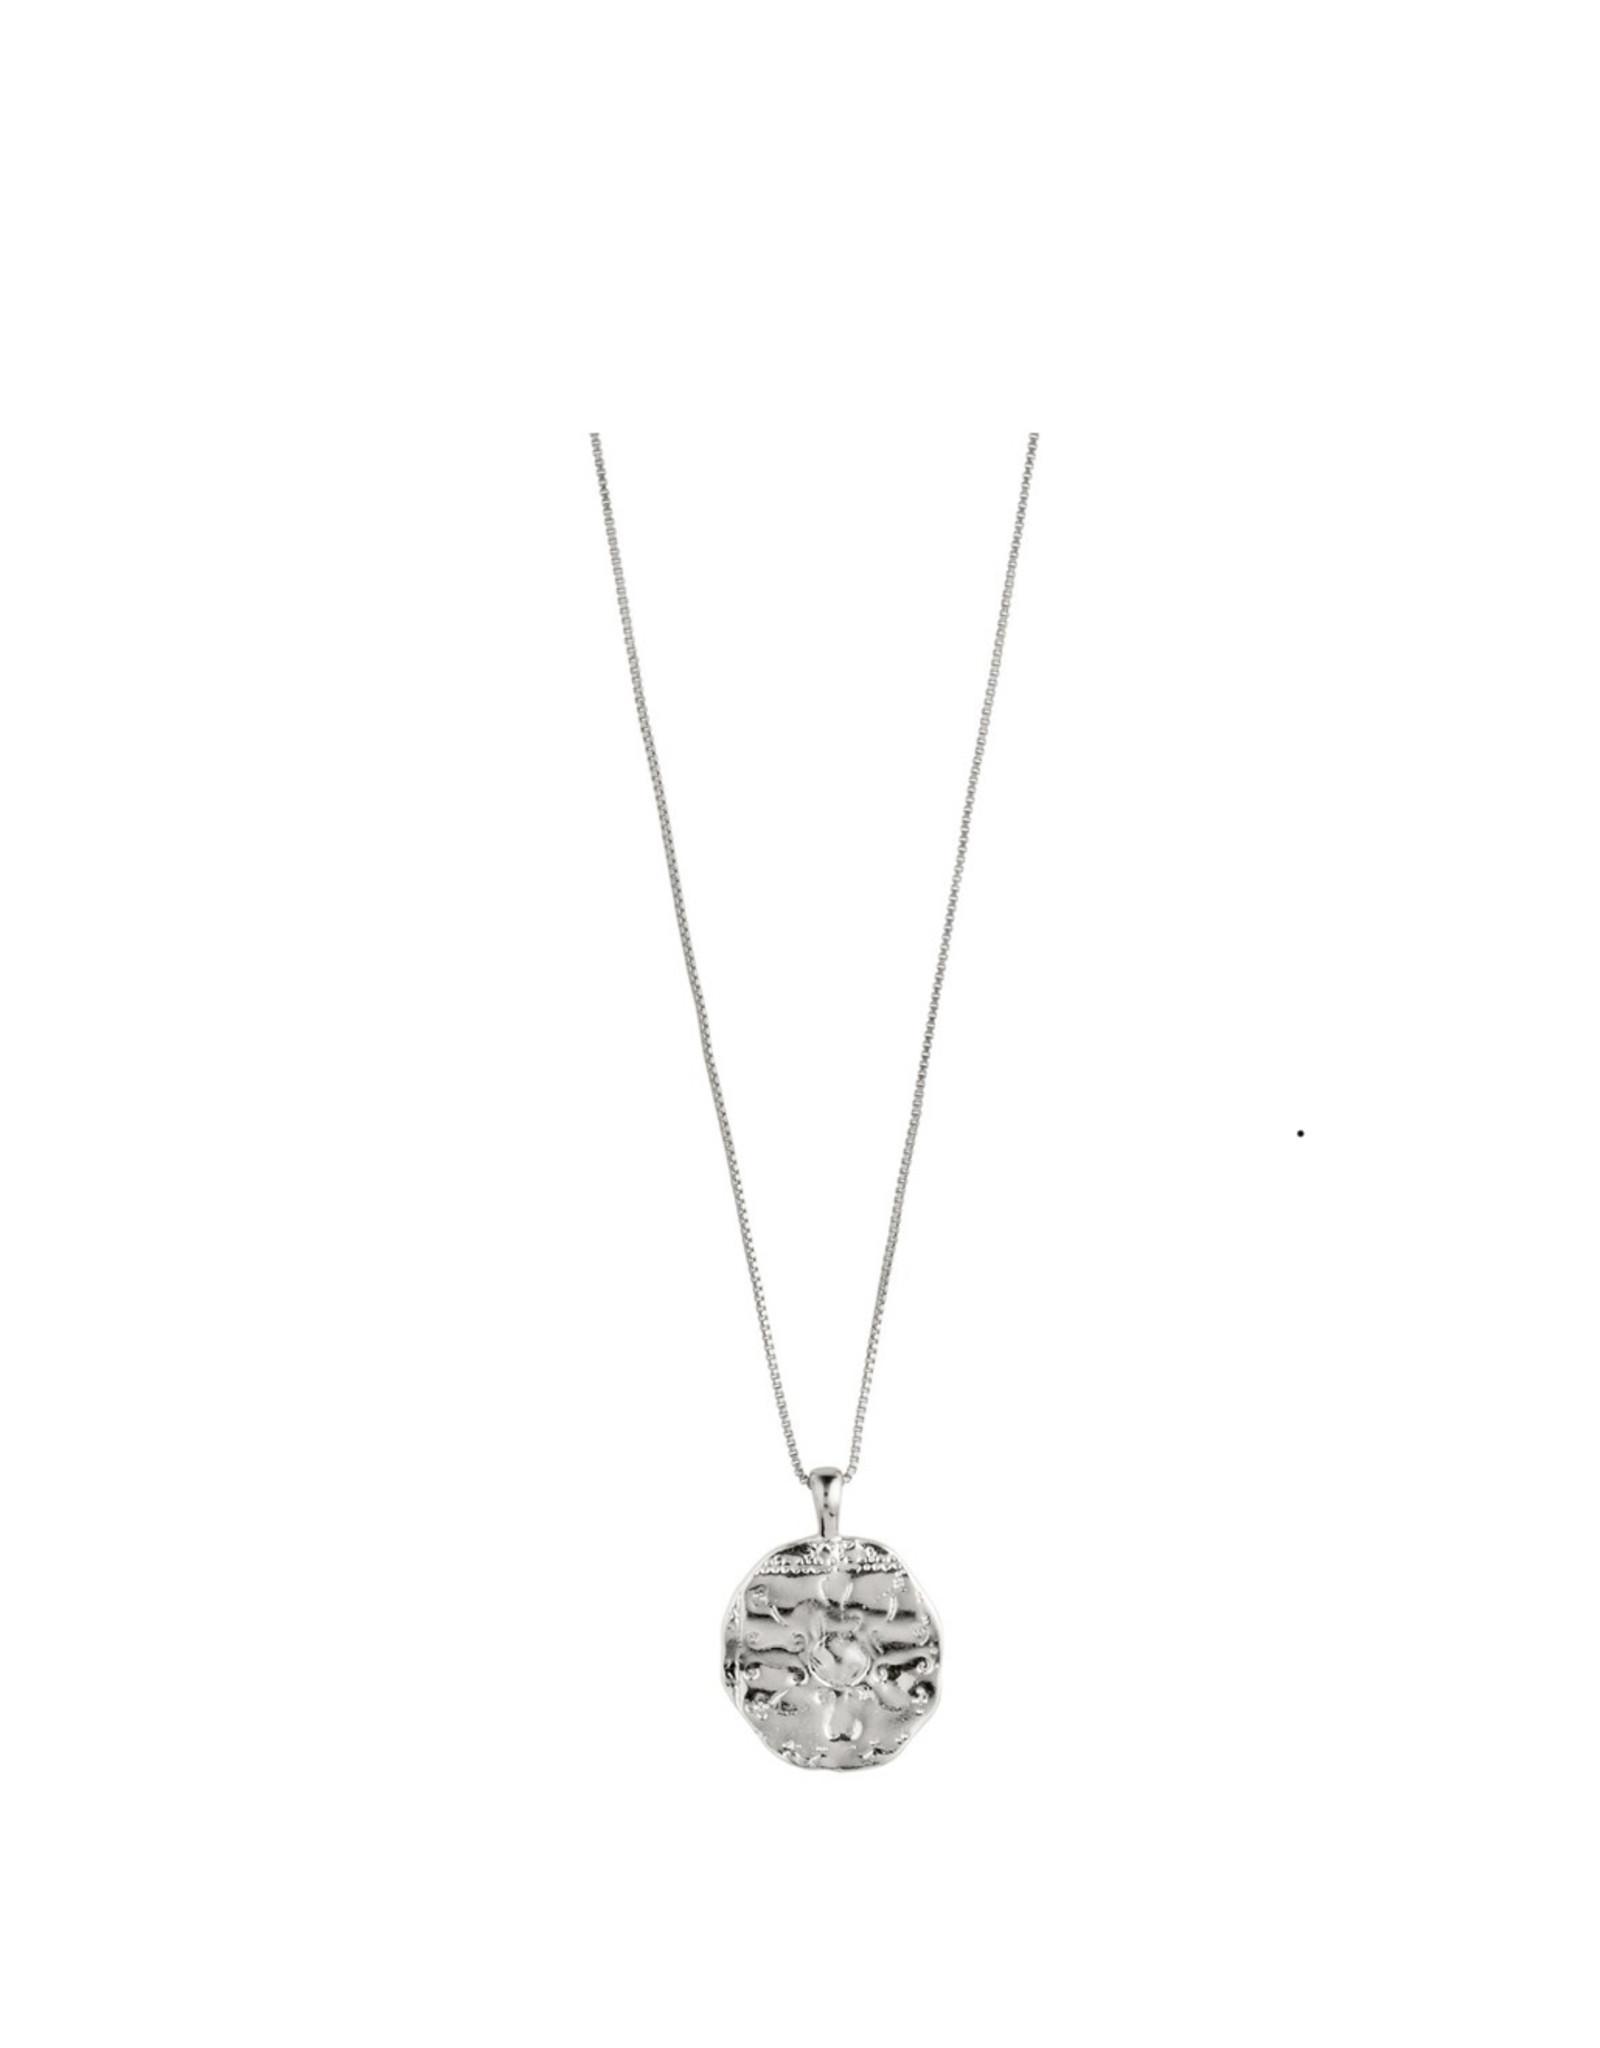 Pilgrim Pilgrim, Affection Necklace, Silver Plated